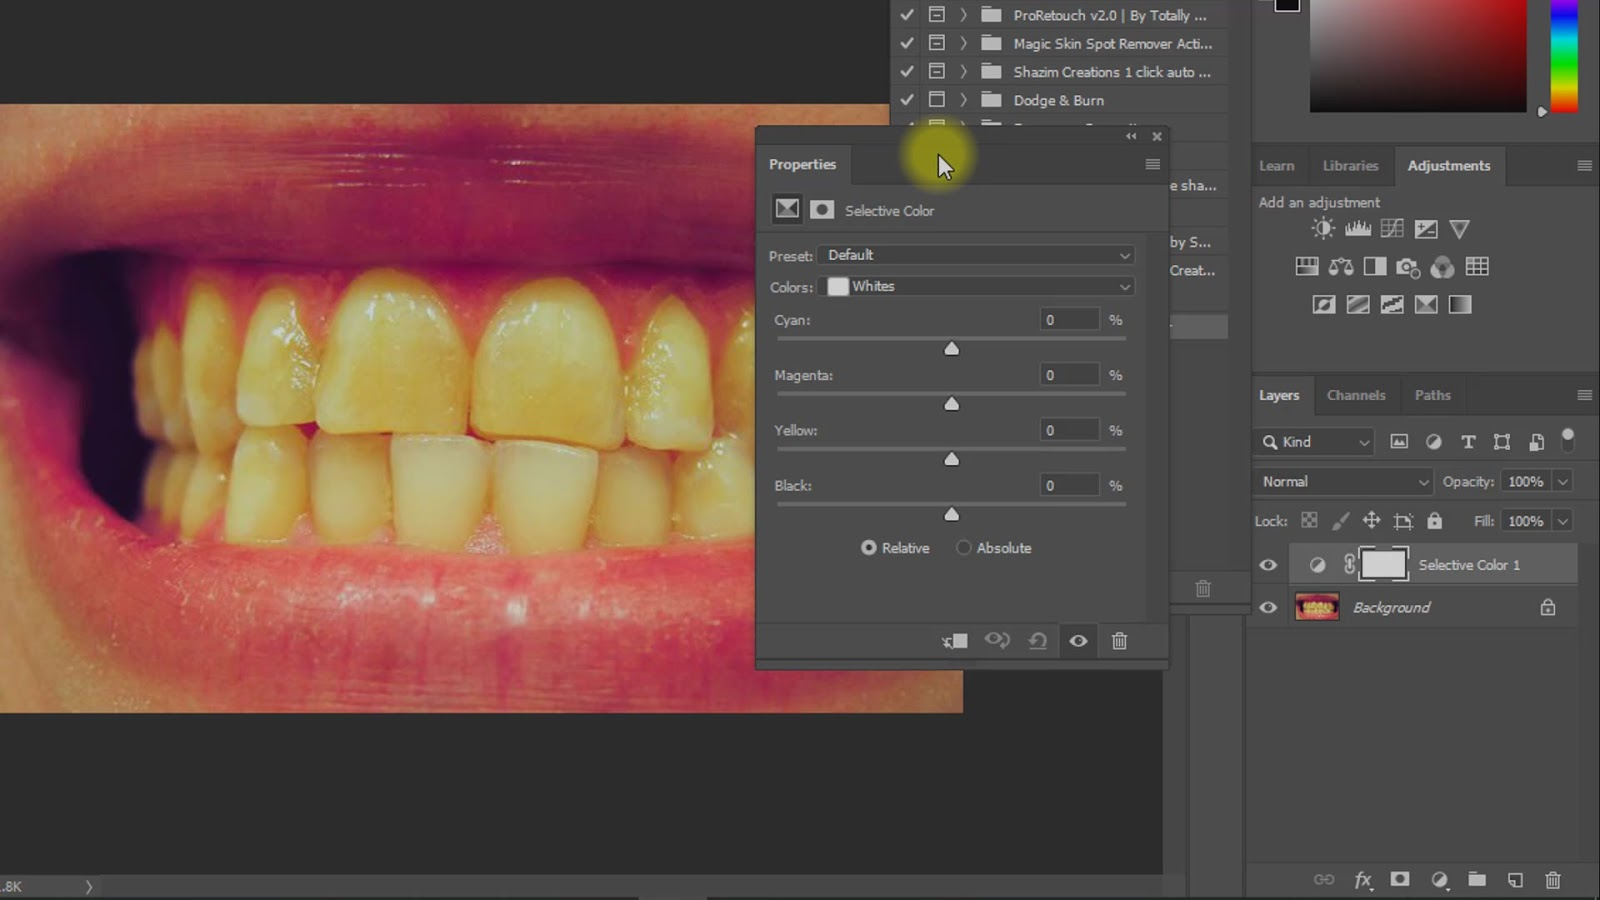 brighten and whiten teeth in photoshop actions screenshot 1